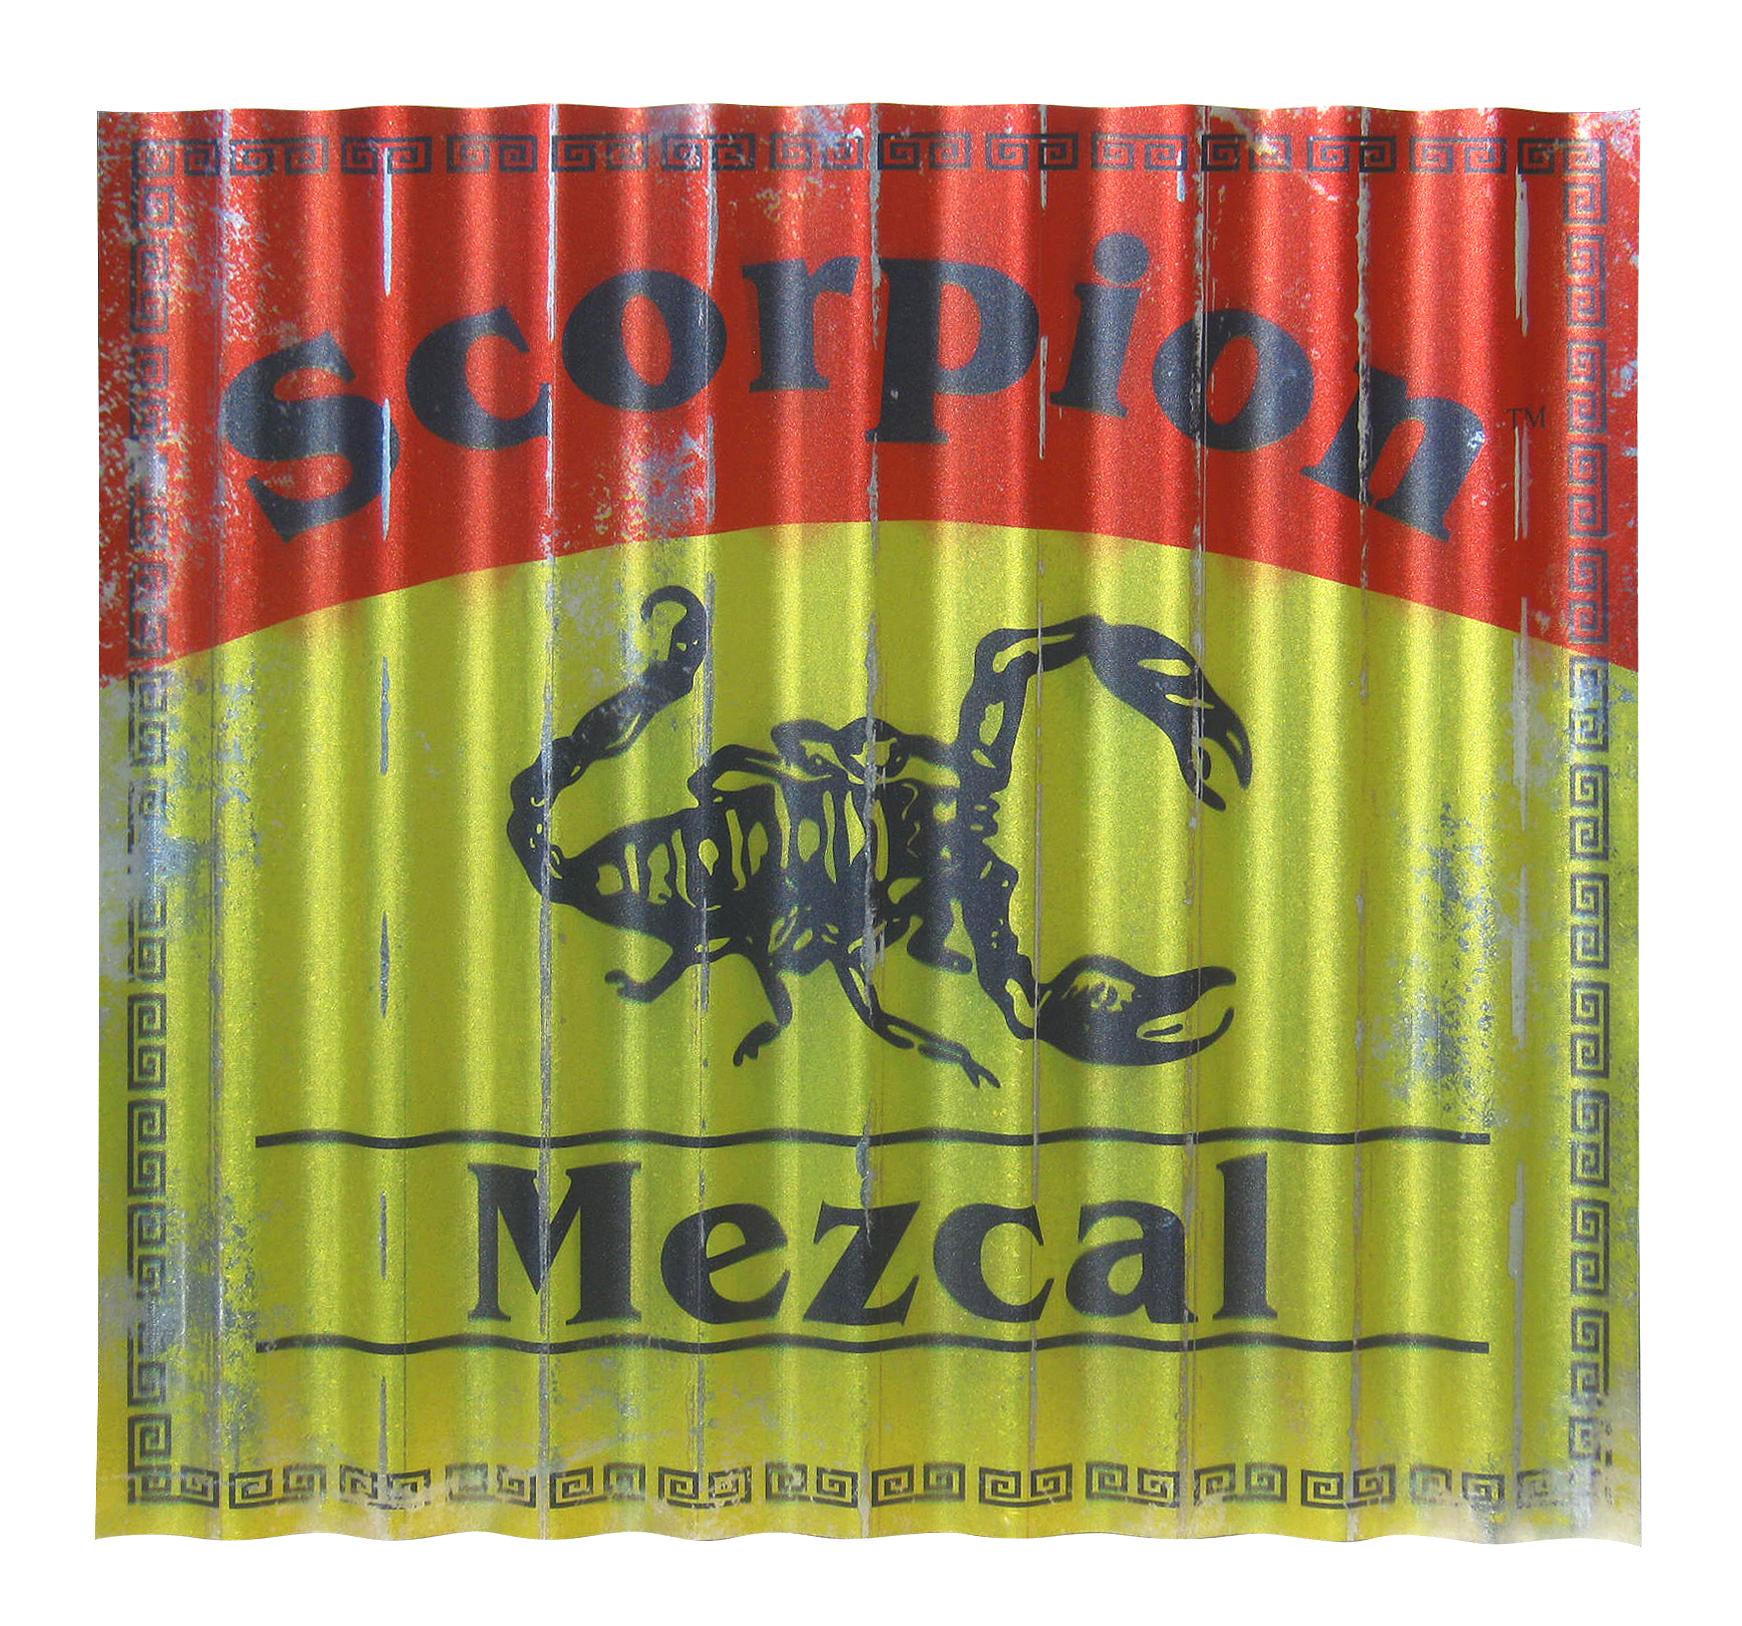 Scorpion Mezcal Galvanized Metal Sign